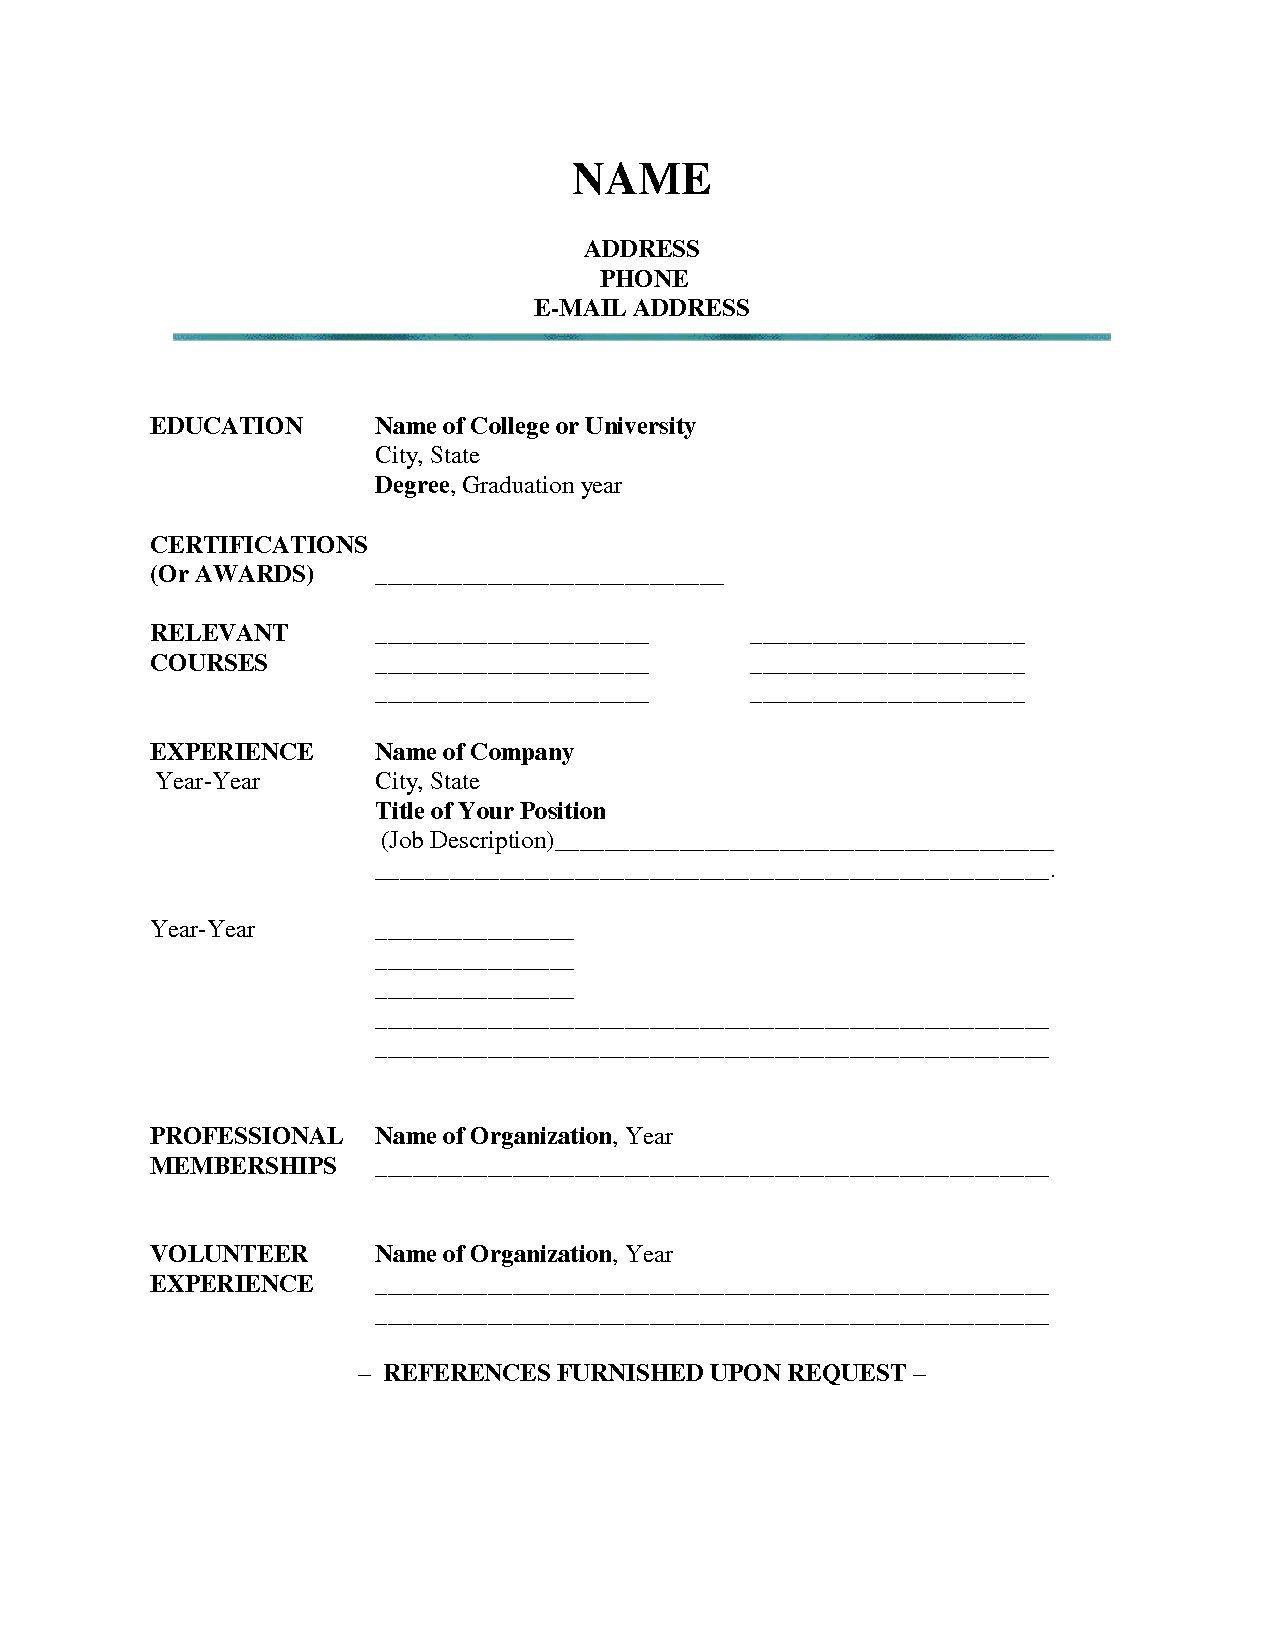 resume builder app Professional in 2020 Student resume